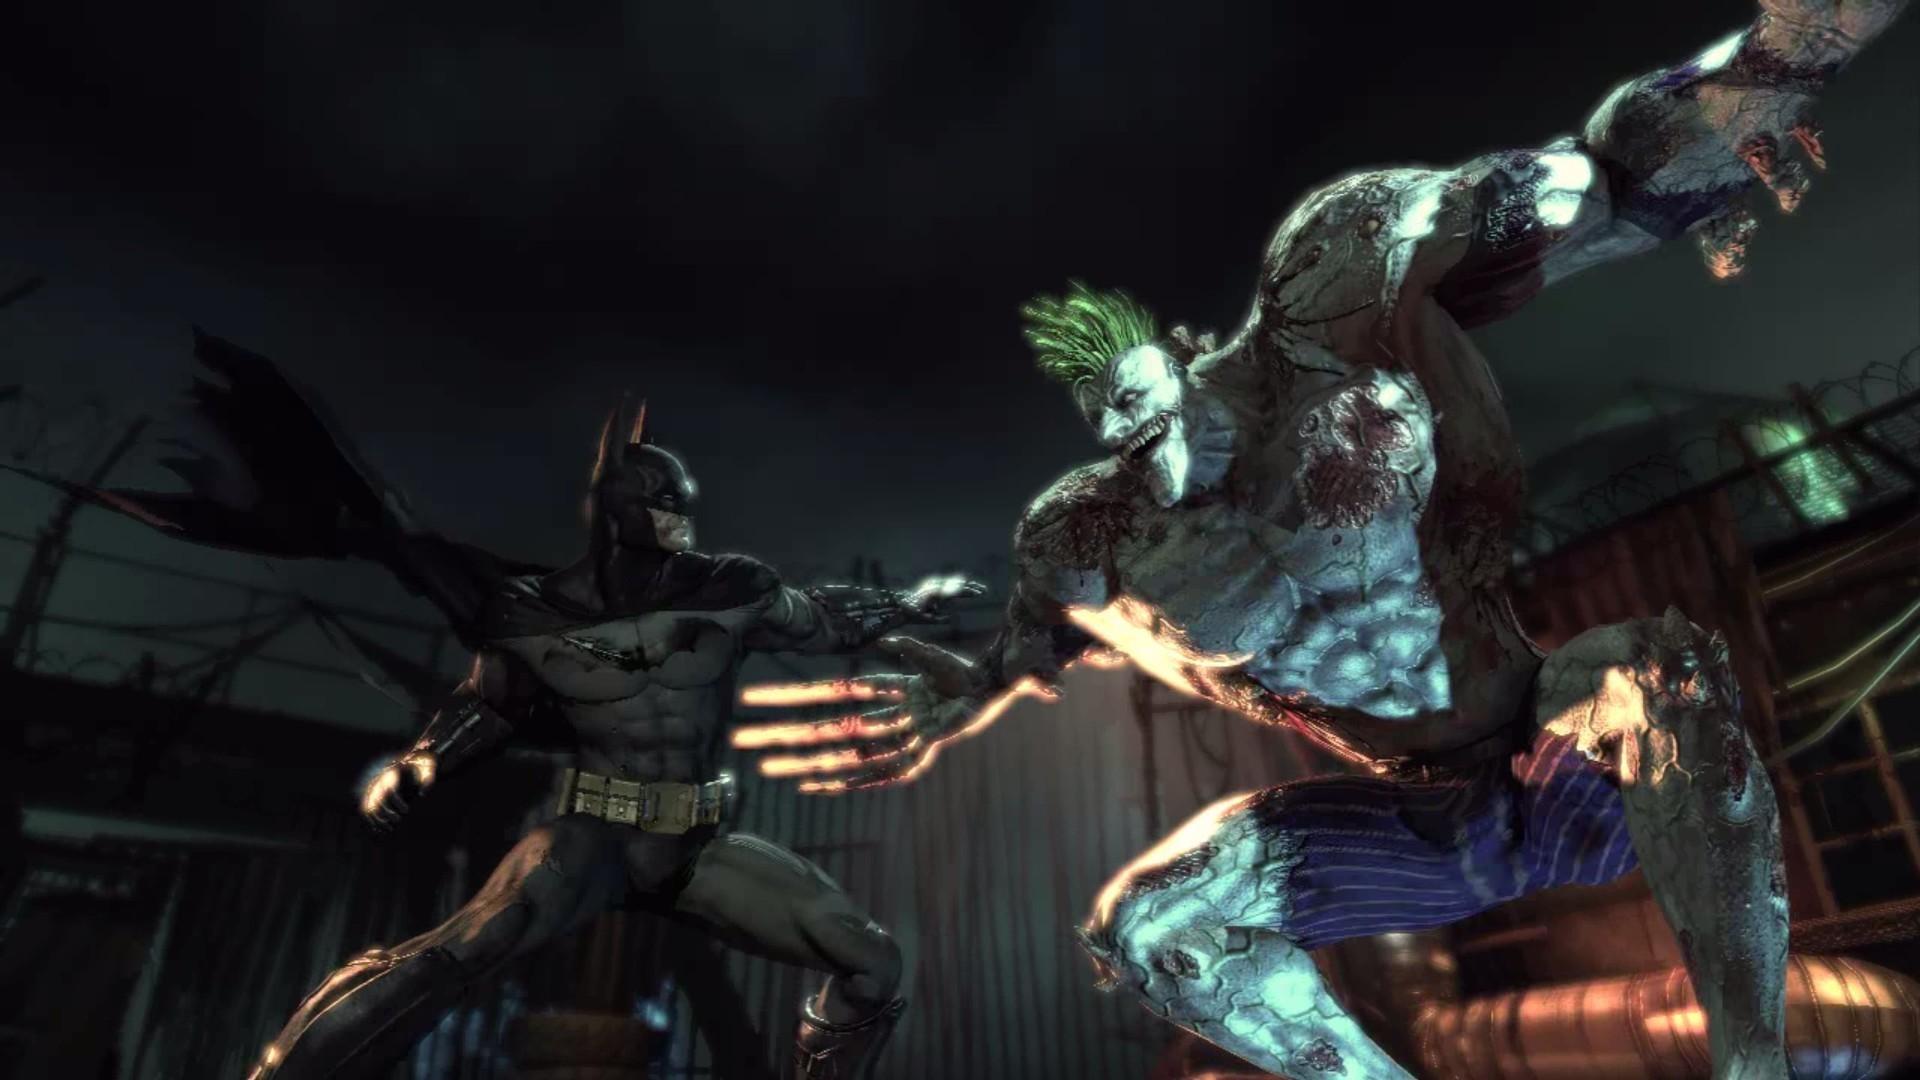 Batman Arkham Asylum Wallpaper Hd 74 Images